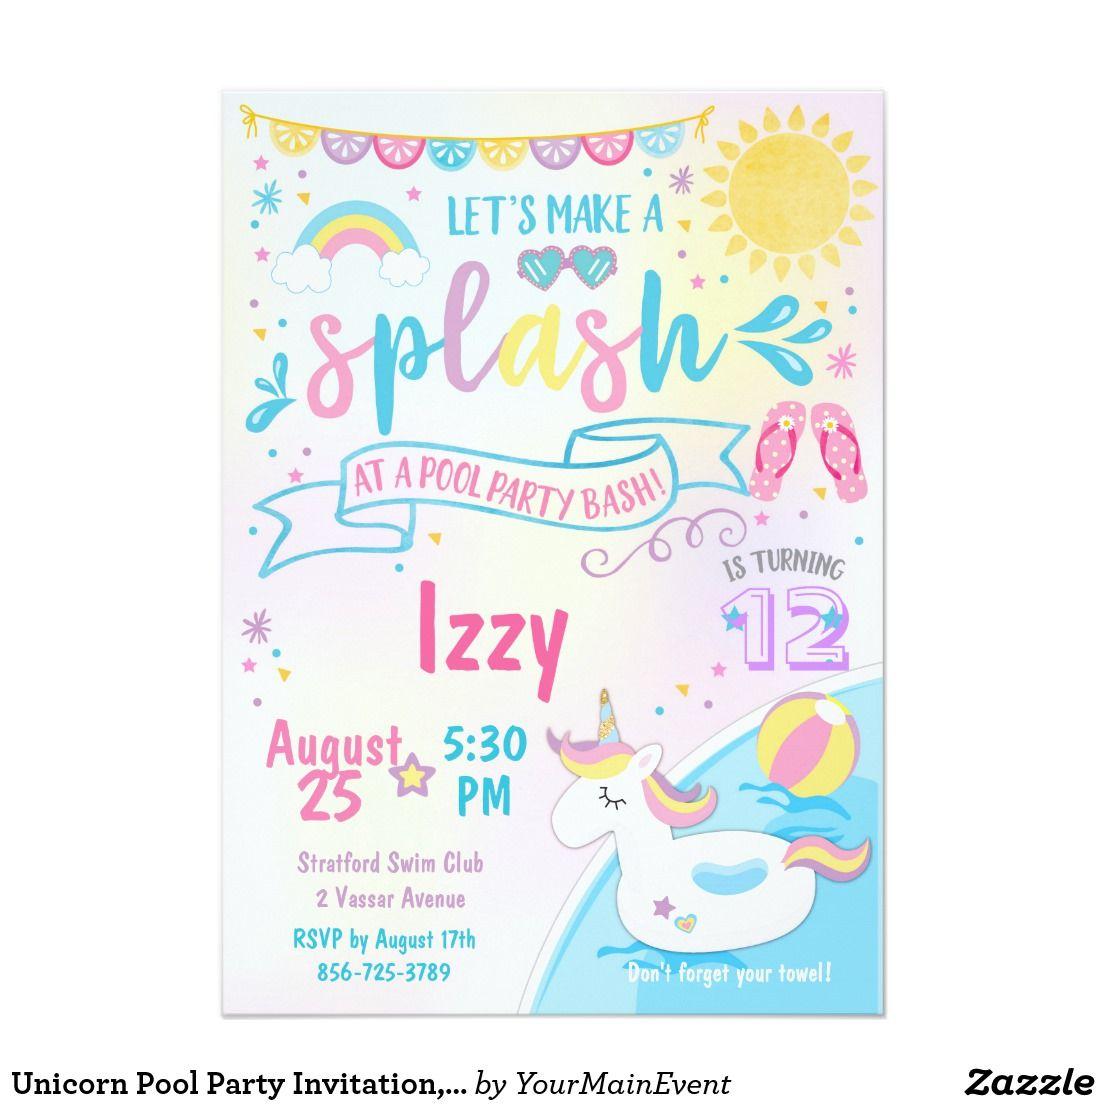 Unicorn Pool Party Invitation, Pool Bash Birthday Invitation | Swim ...